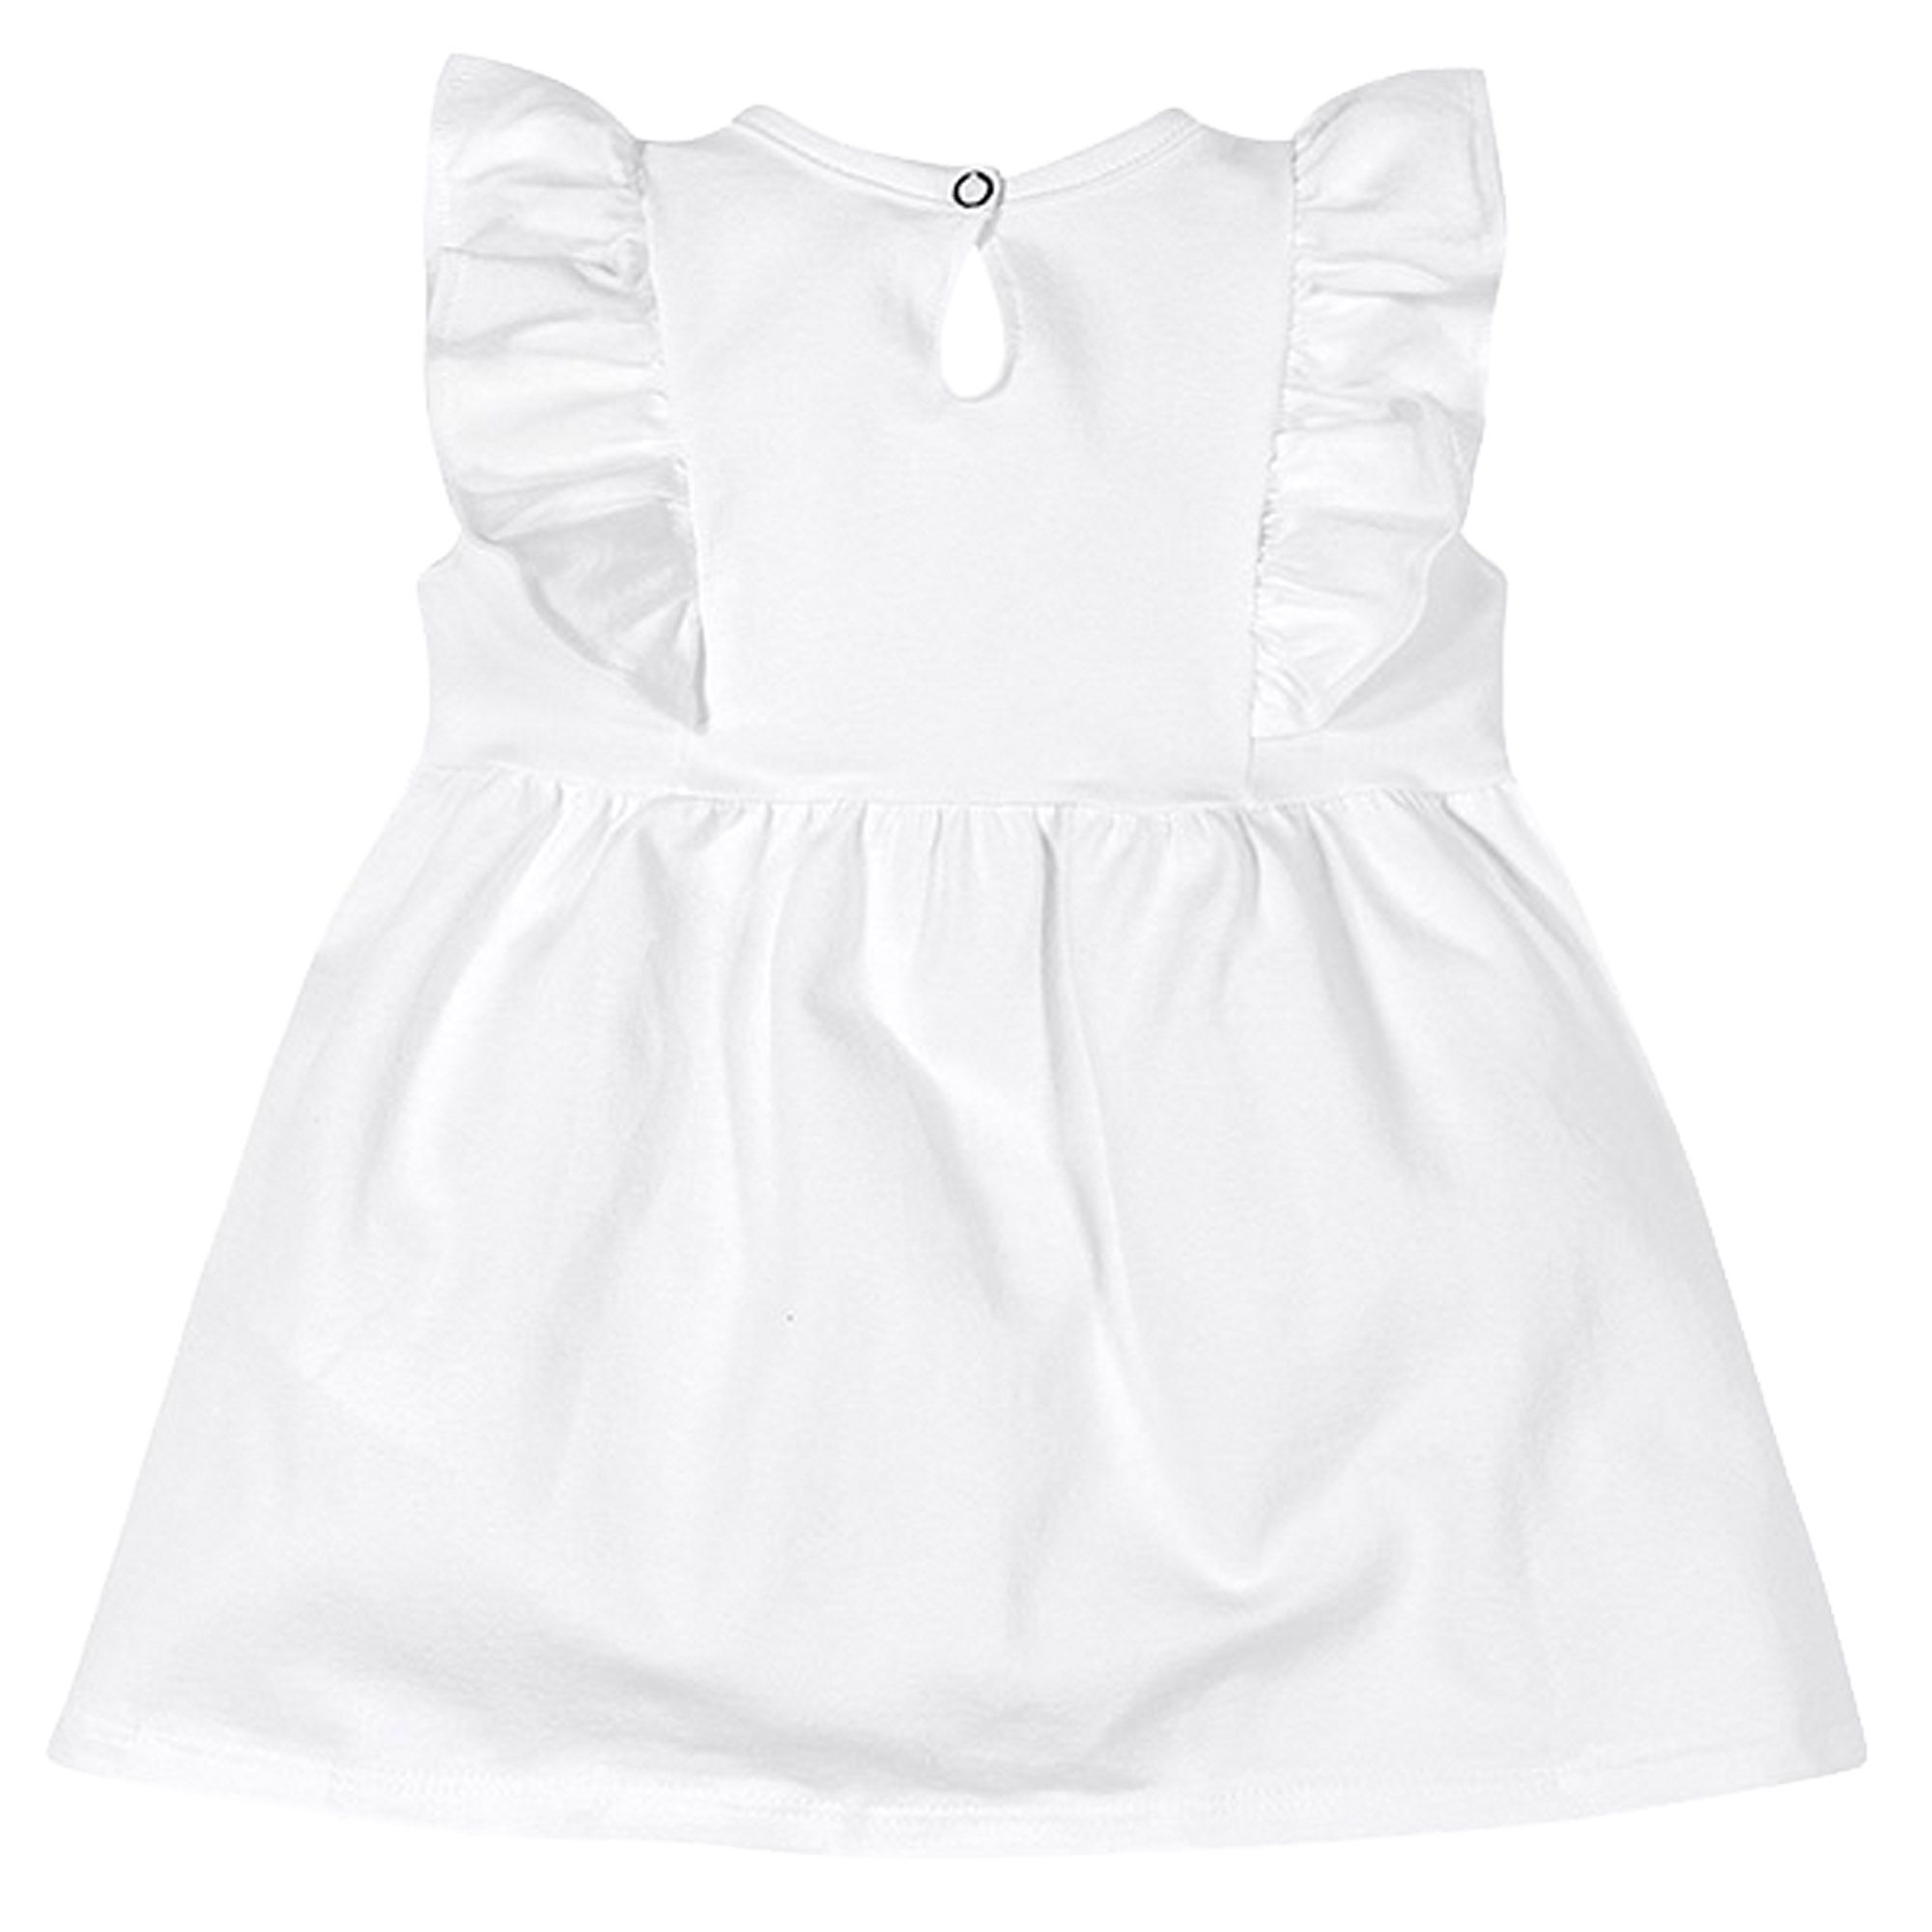 Vestido Brandili Baby Estampa Ramalhete Flores - P ao G